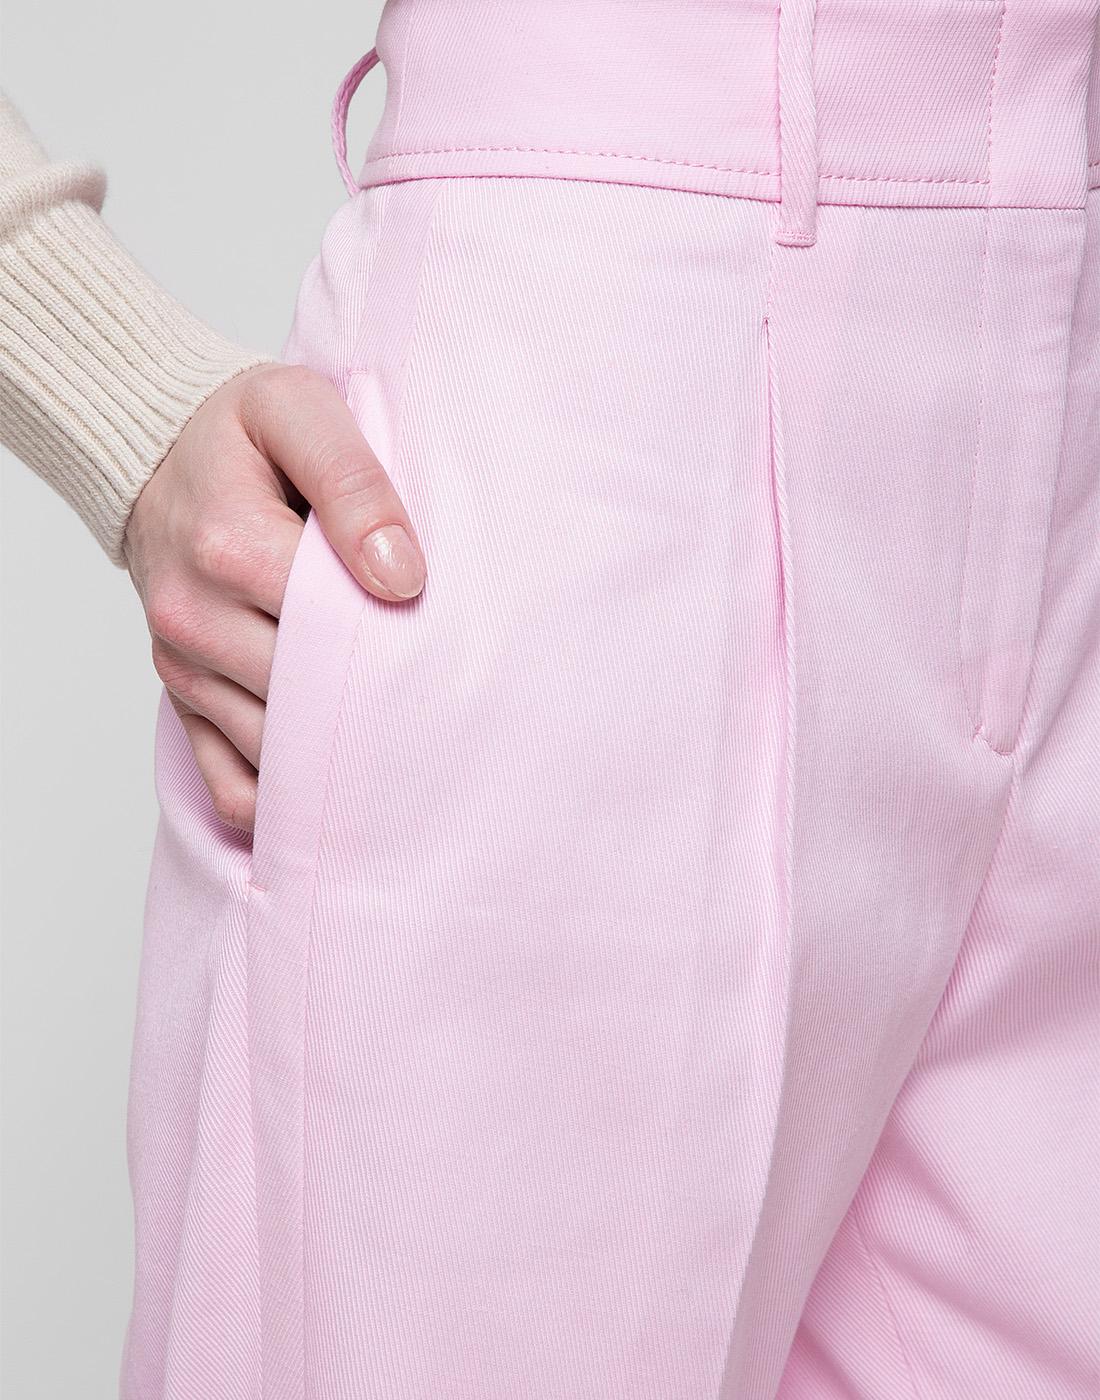 Женские розовые брюки Dorothee Schumacher S640403/421-6